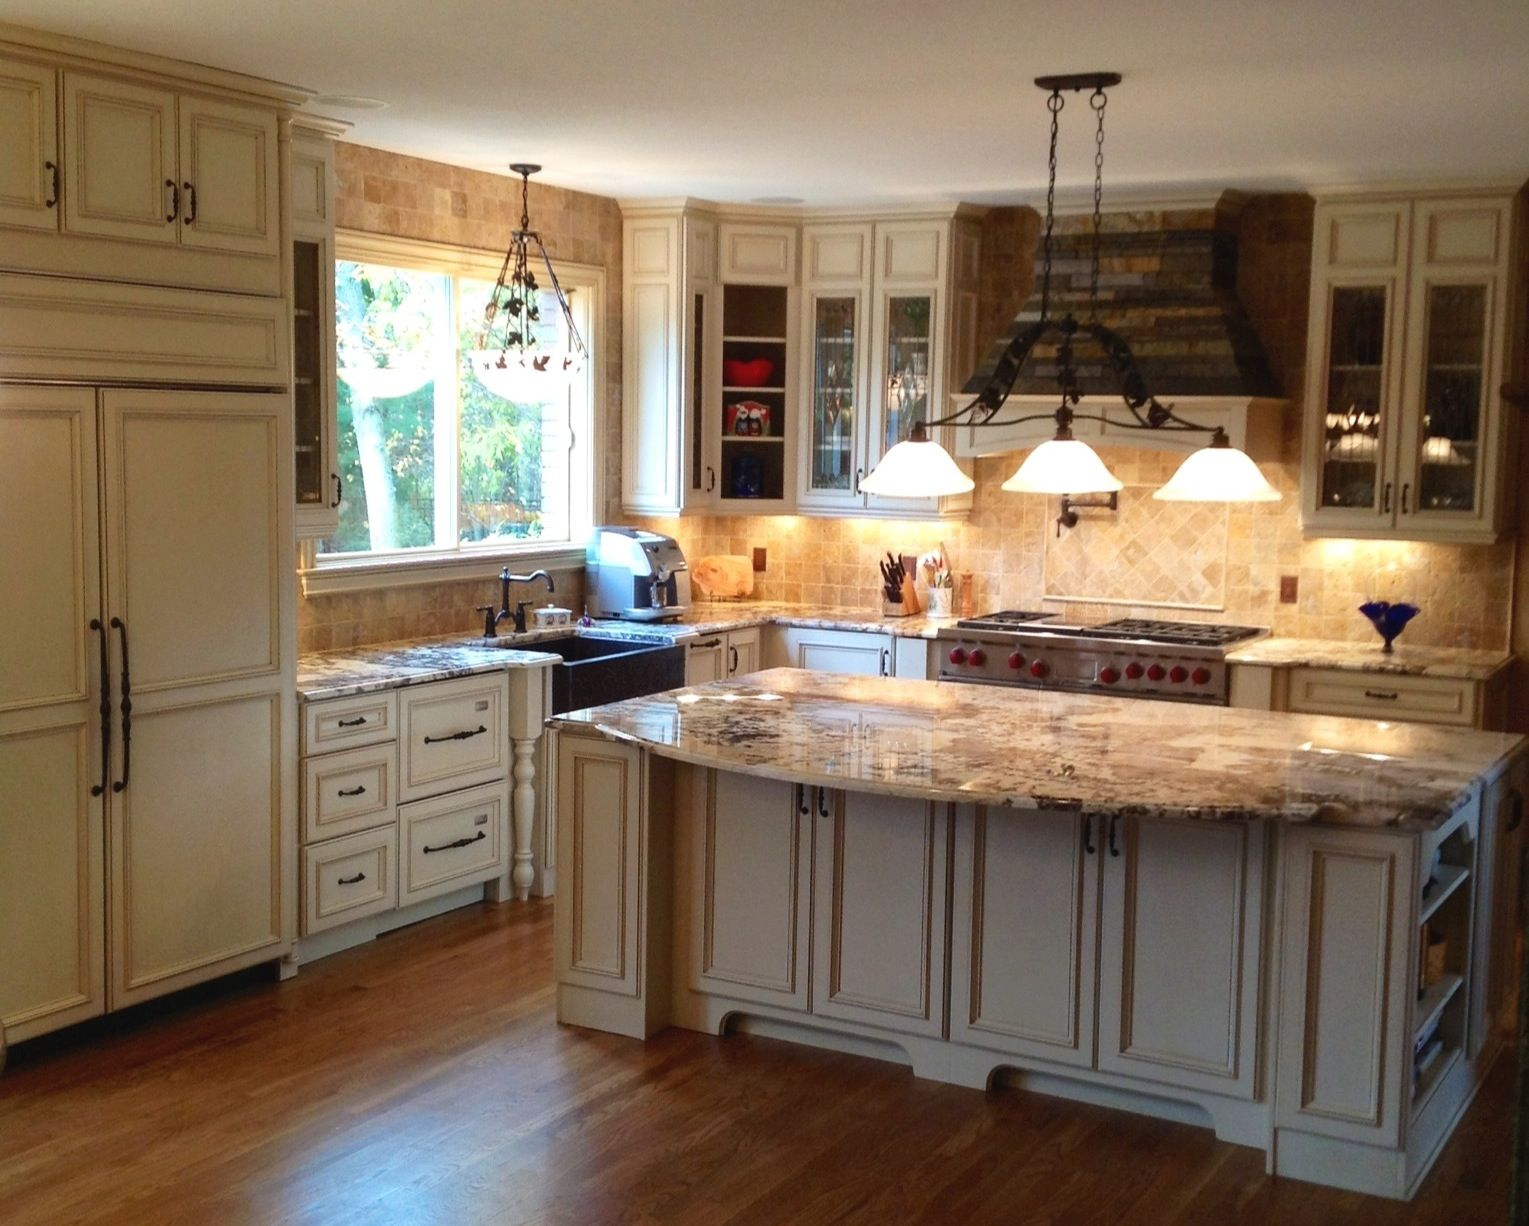 40 Best Kitchen Cabinets Images On Pinterest  Classic Cabinets Glamorous Kitchen Cabinet Packages Inspiration Design